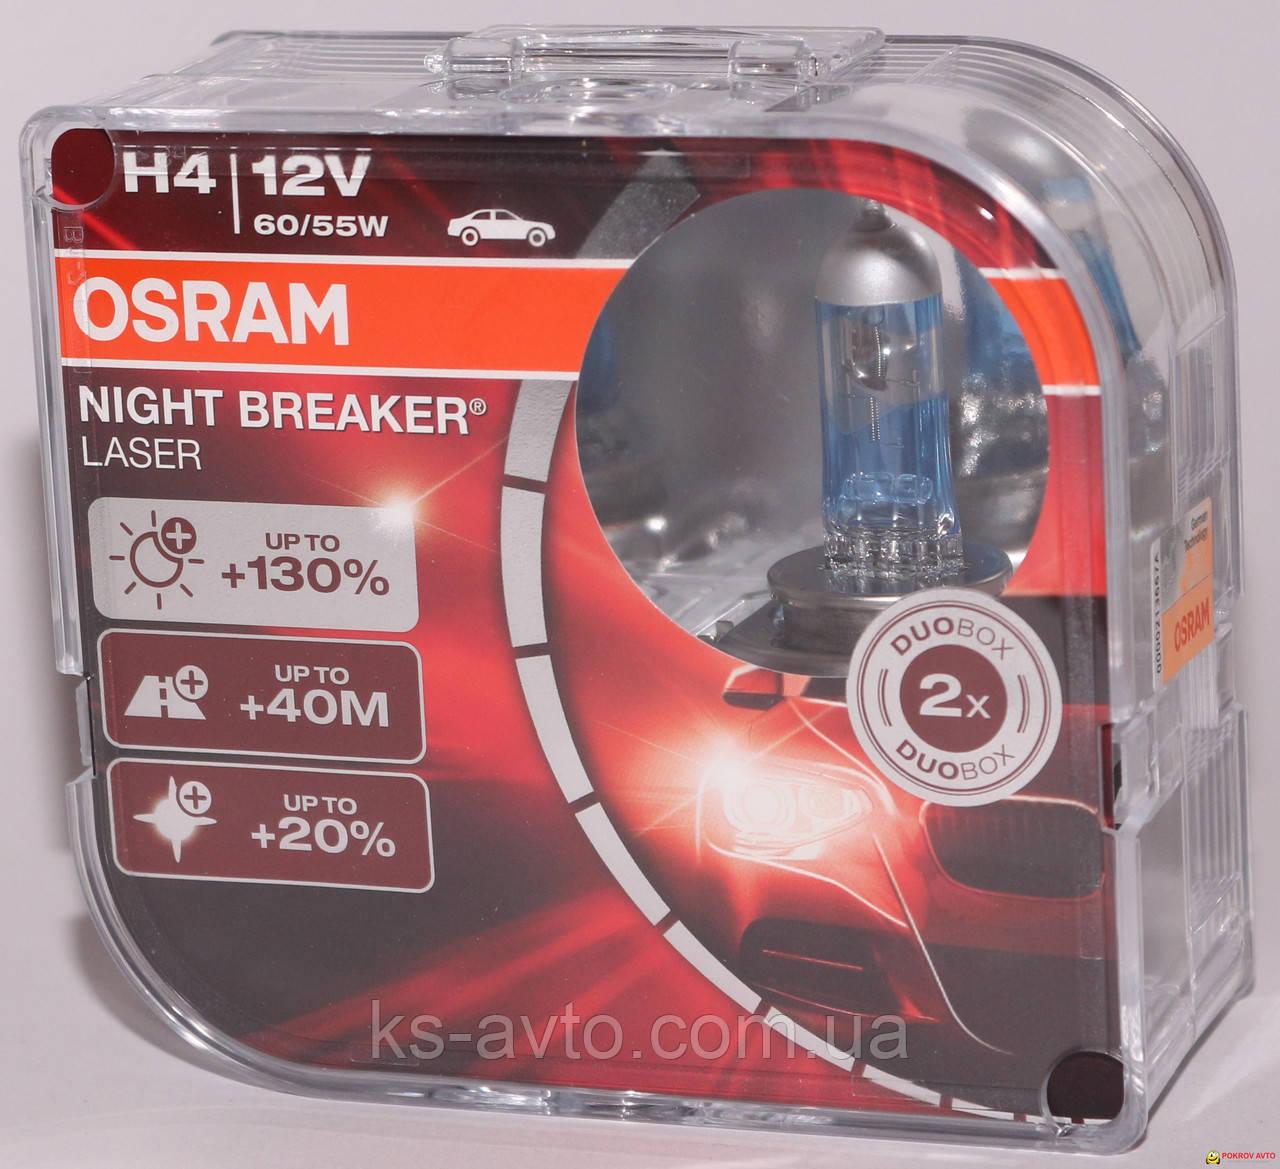 АВТОЛАМПА OSRAM H4 64193NBL+130% NIGHT BREAKER LASER  (2ШТ. DUOBOX)